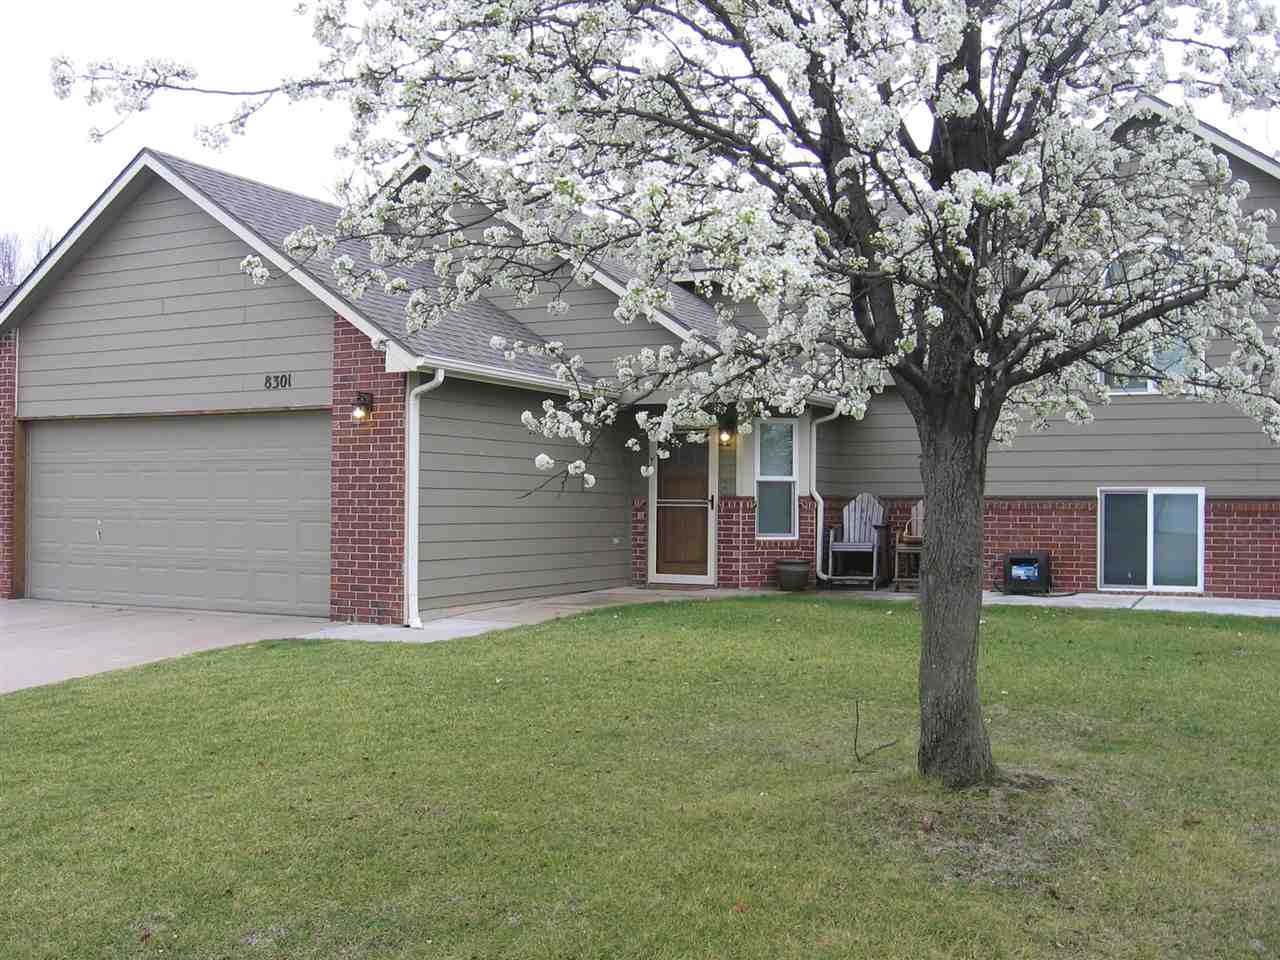 8301 W Aberdeen Cir., Wichita, KS 67212